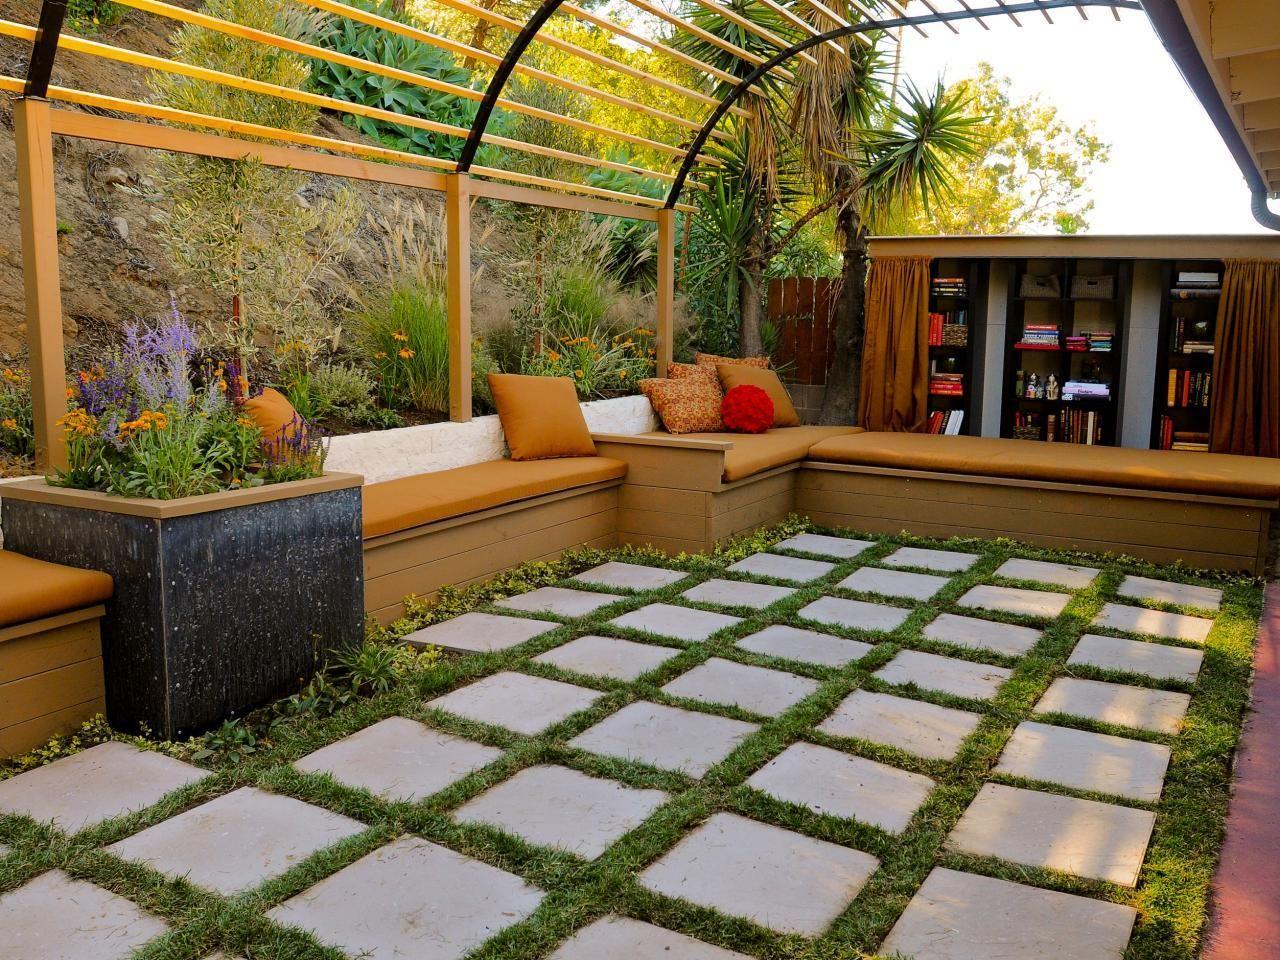 Awesome Pergola Design Ideas, Turn Your Garden Into a Peaceful ...